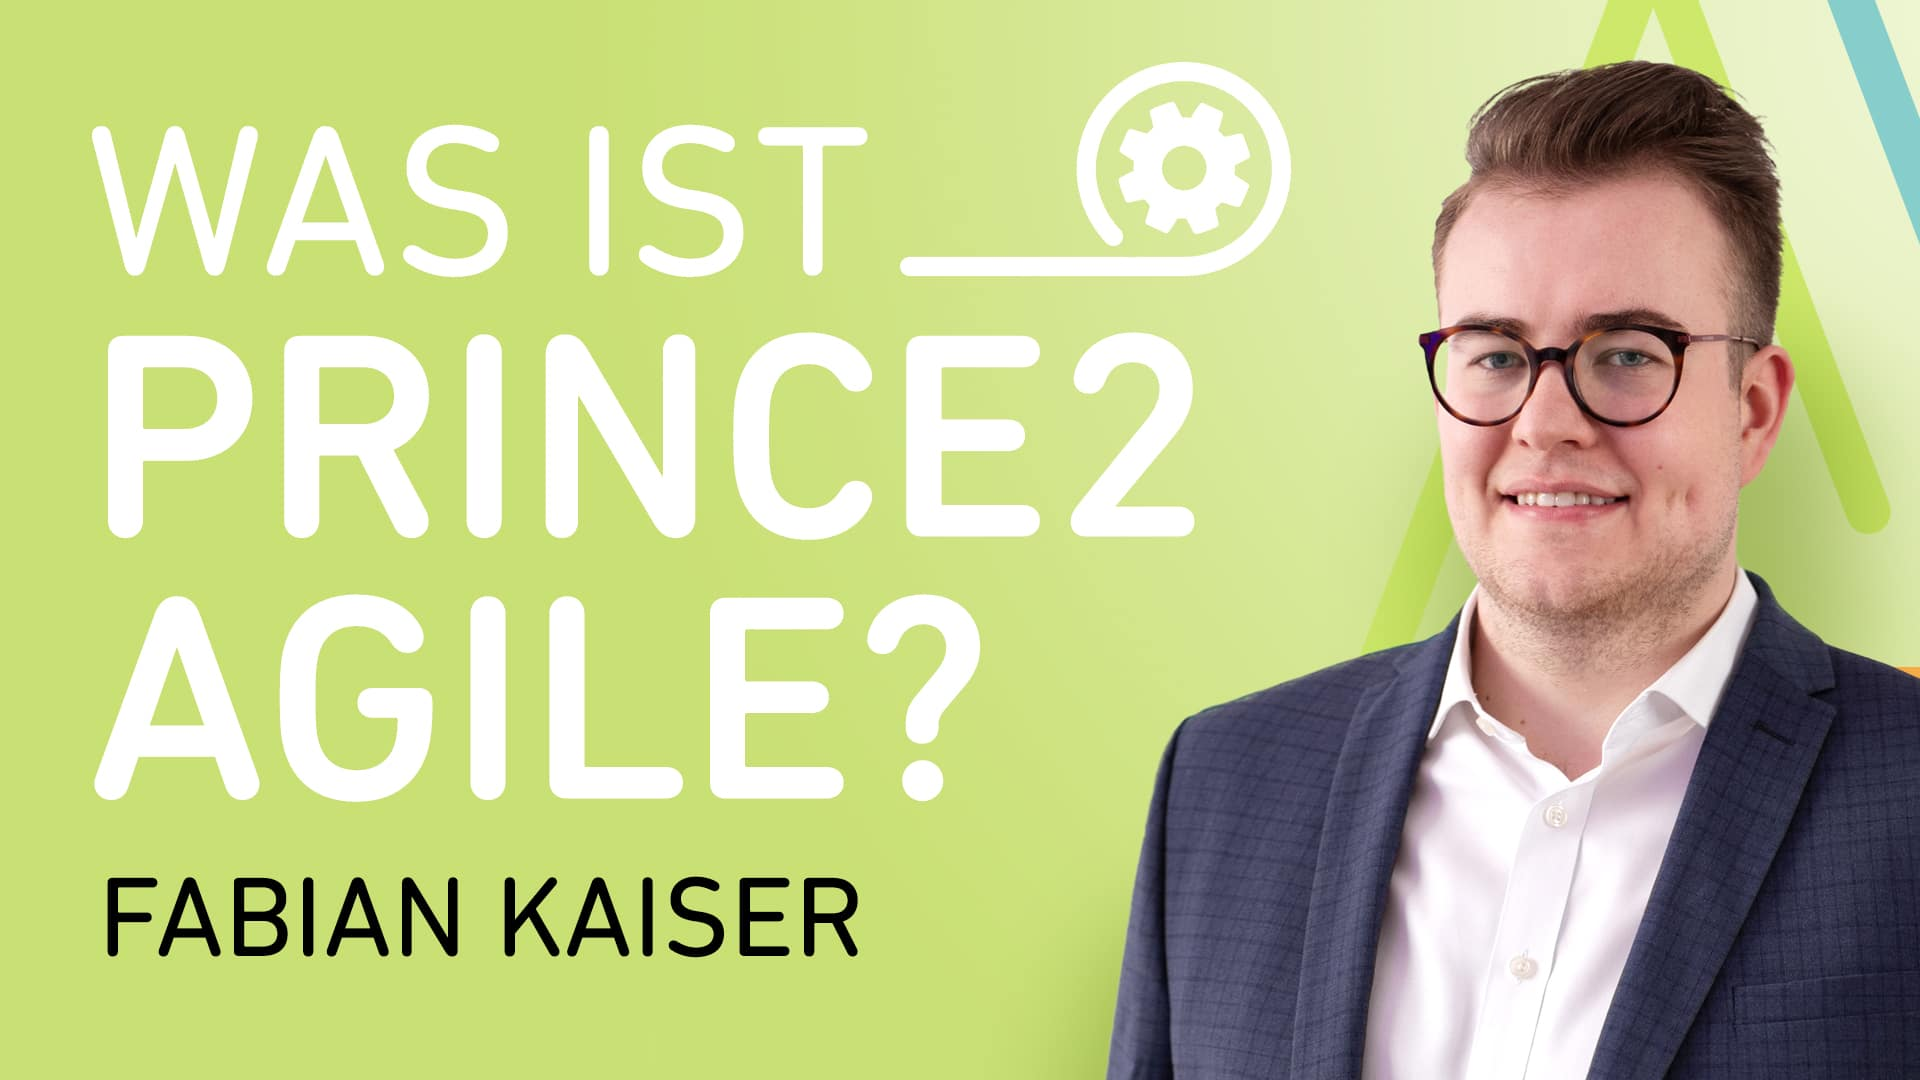 Was ist Prince2 Agile?